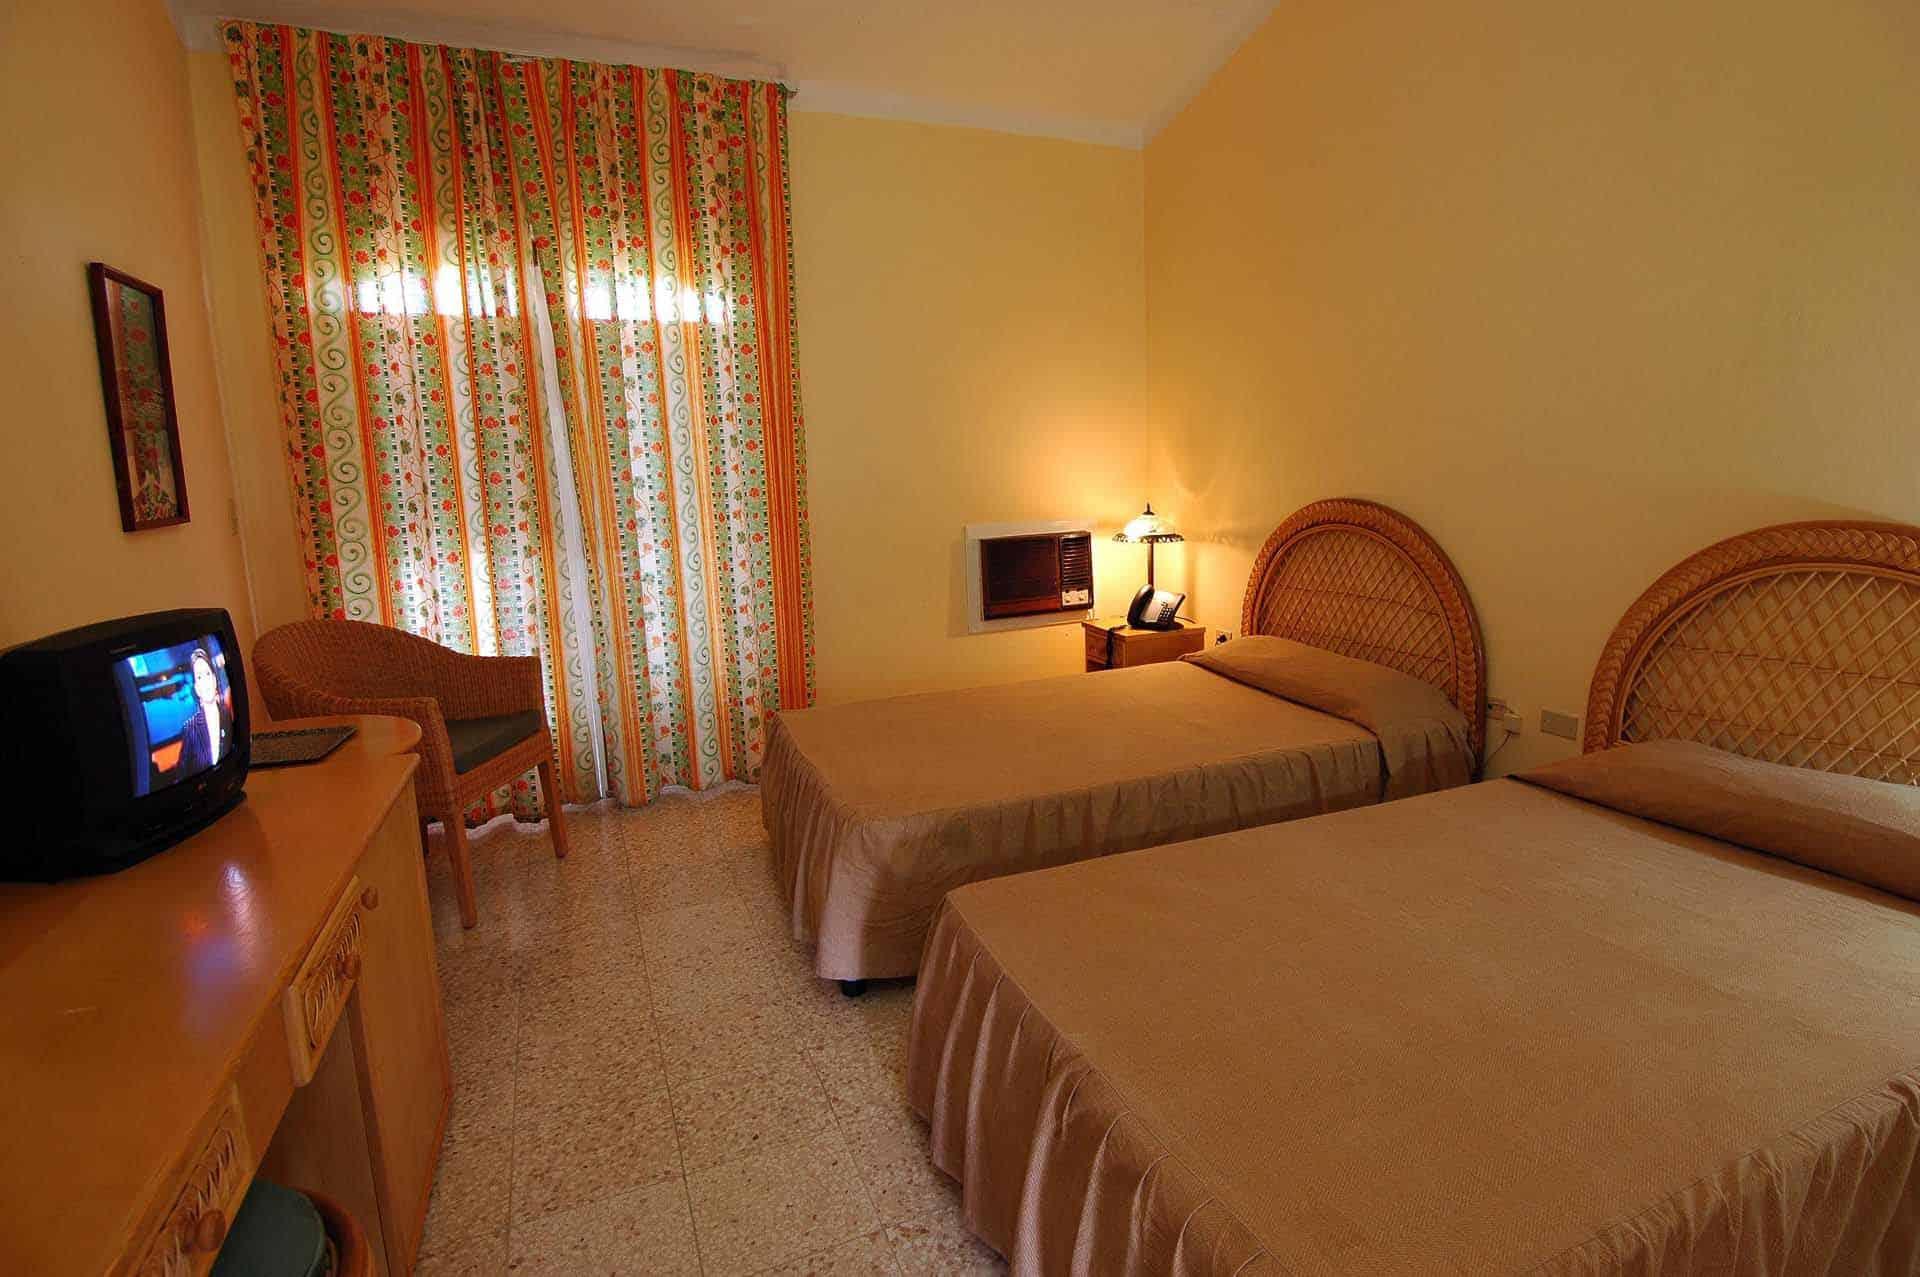 H1234 Hotel Los Jazmines 02 cuba autrement